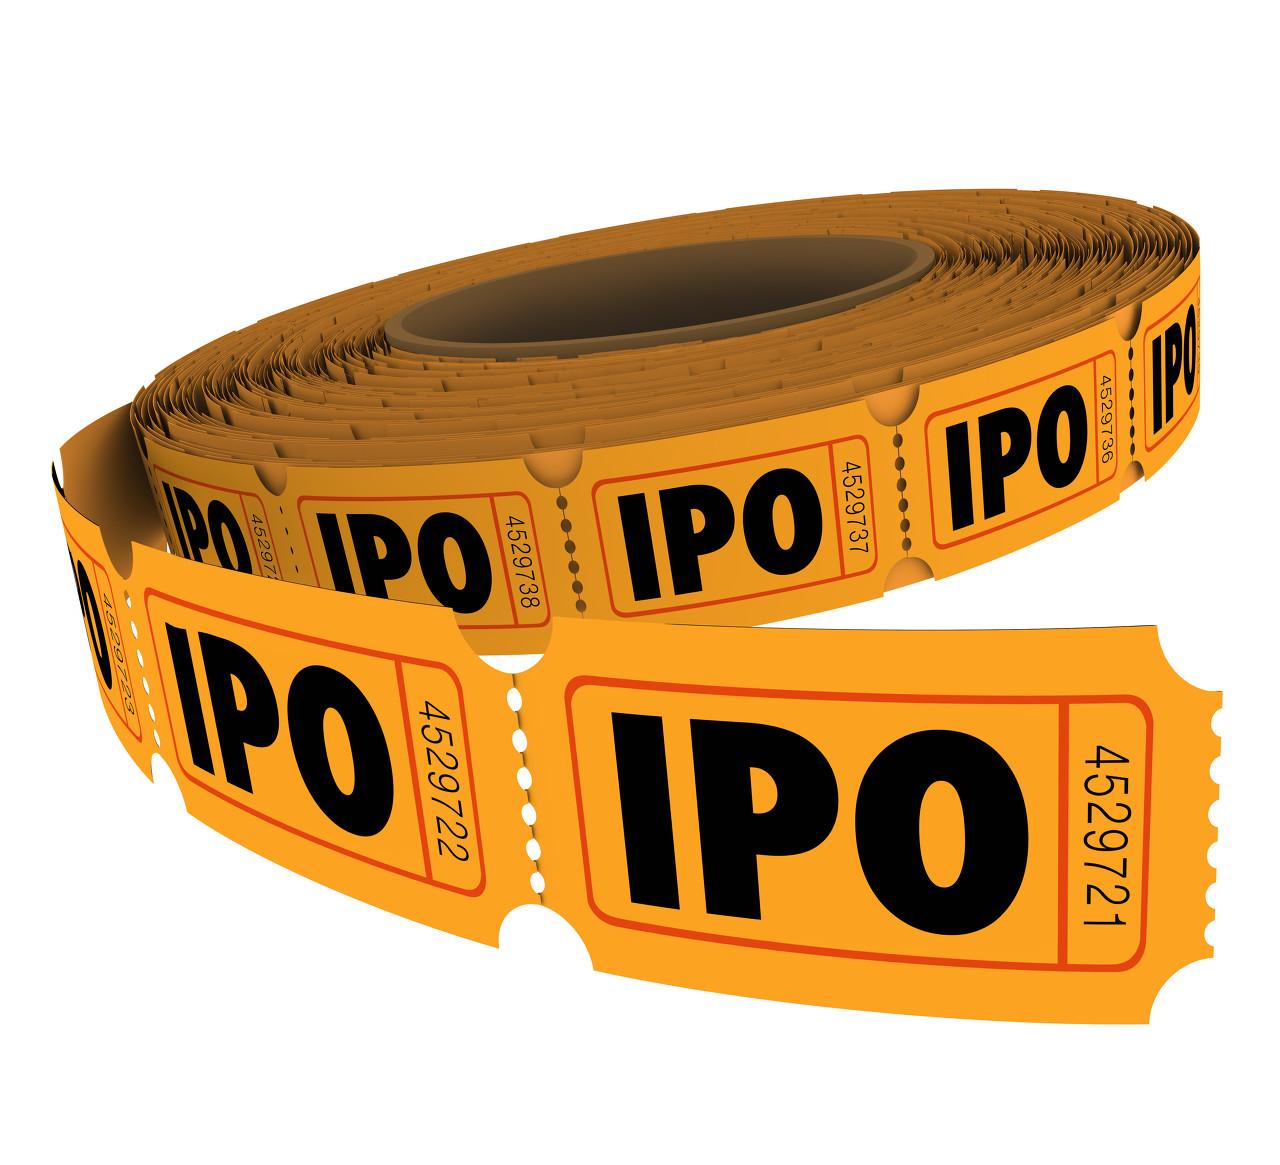 IPO 图虫创意-452744442800767432